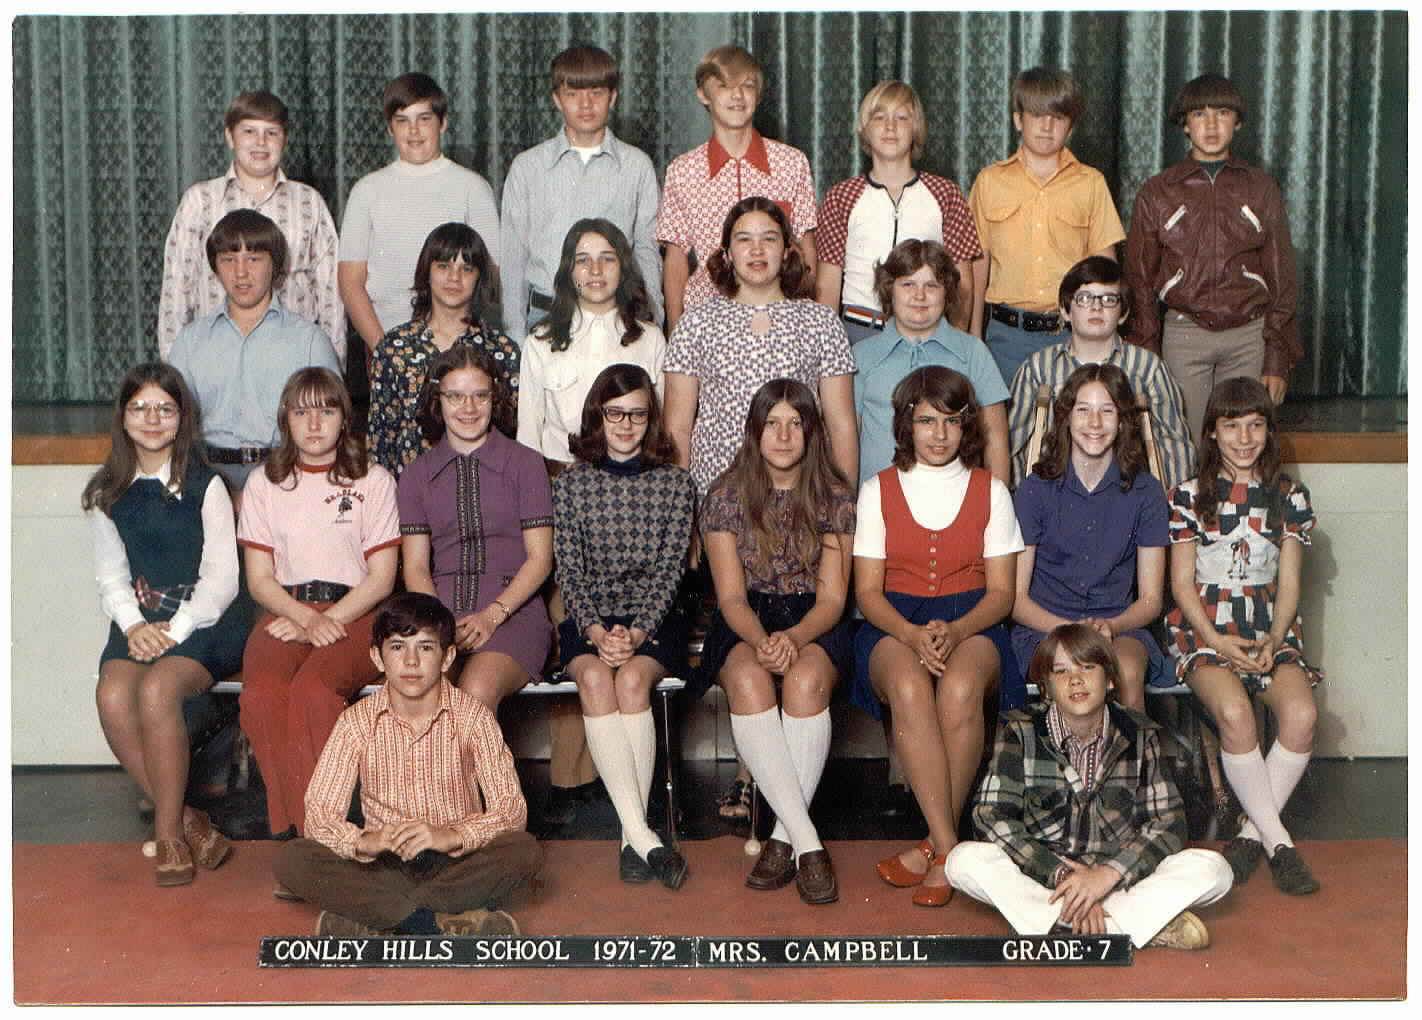 conley hills elementary school 7th grade